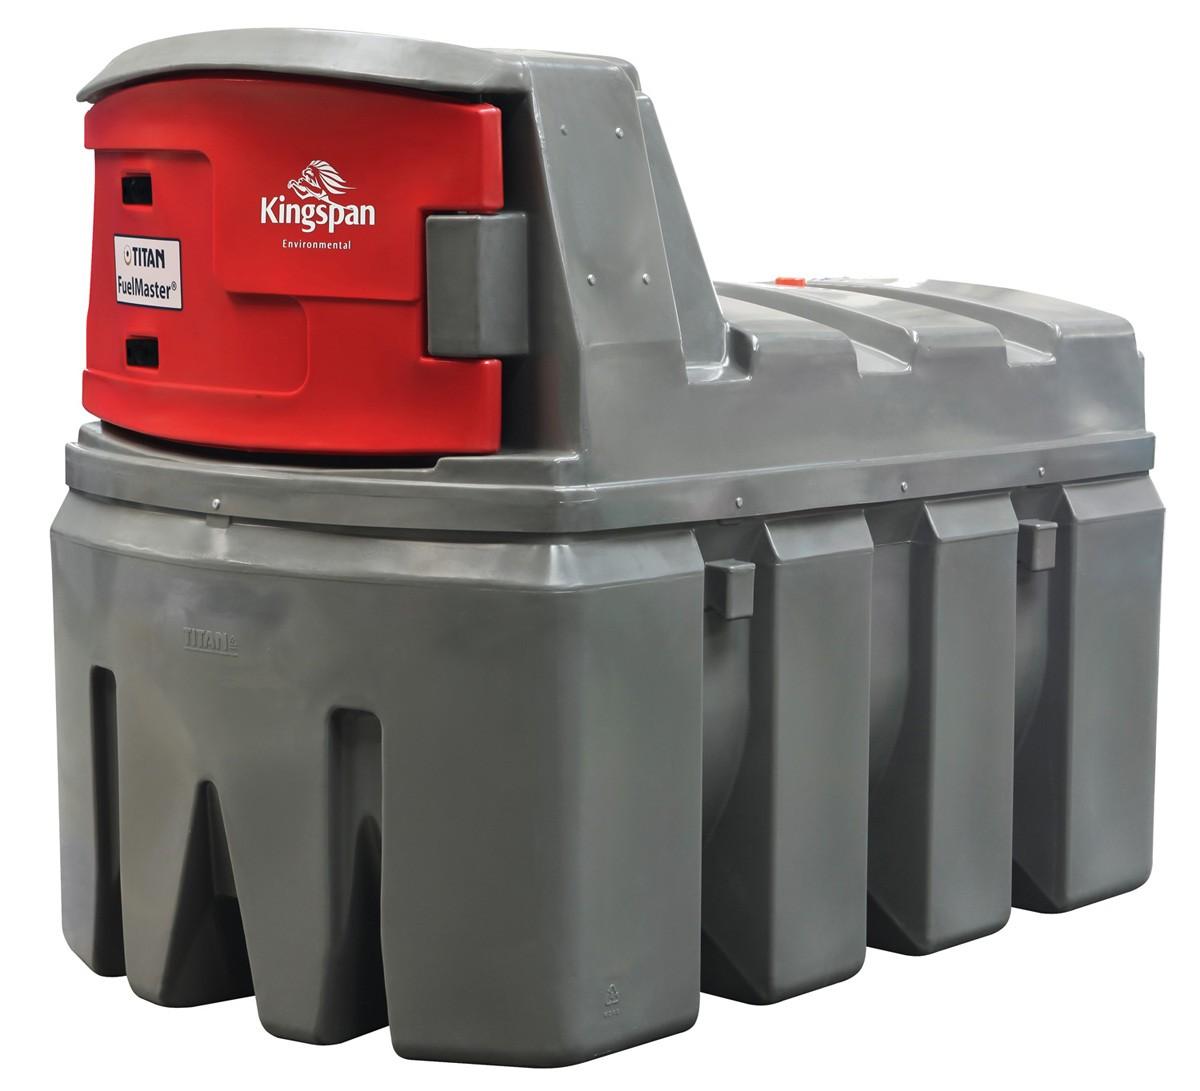 fuelmaster standard 1 2500 liter pumpe 230v 72 l min mechanisches z hlwerk k33 4m schlauch. Black Bedroom Furniture Sets. Home Design Ideas